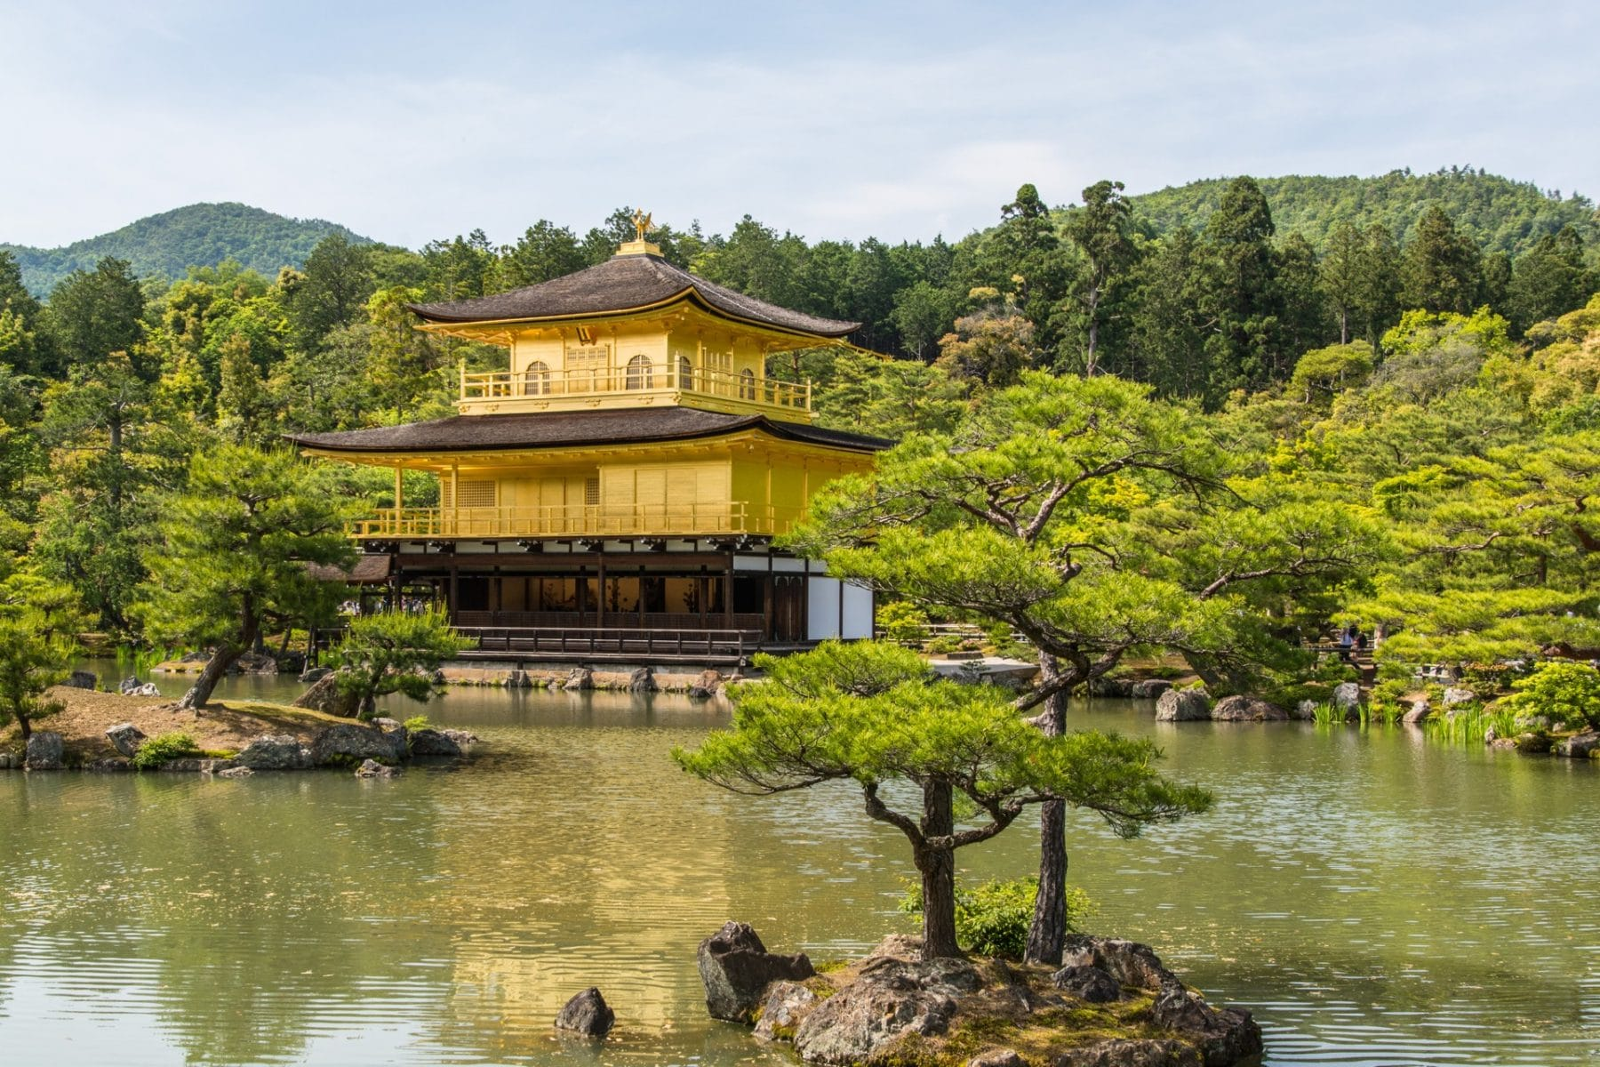 pavillon d'or - kinkaku-ji - kyoto